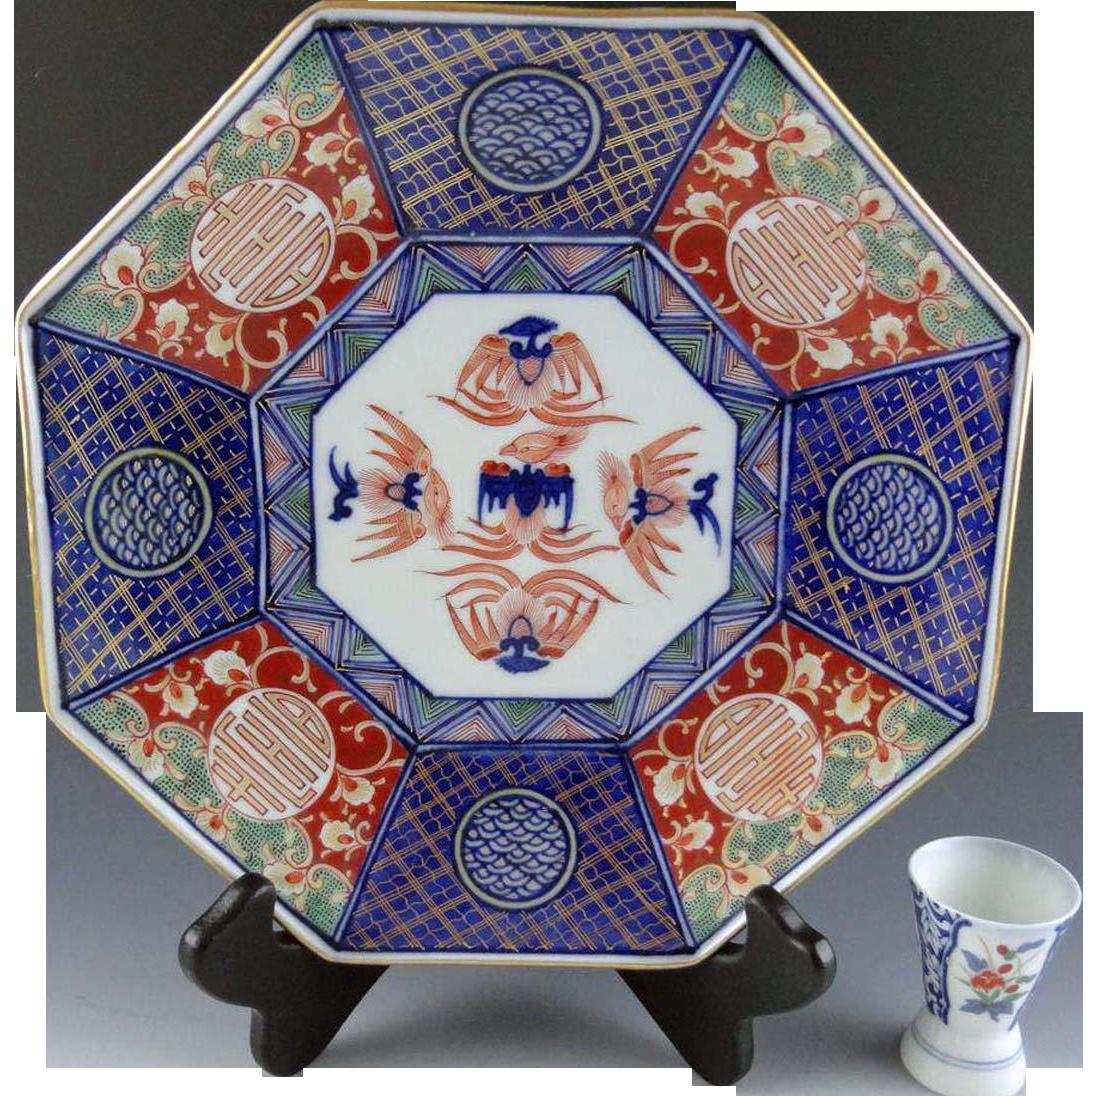 Japanese Antique Imari Porcelain Nakazaro Hakkaku-zara Plate